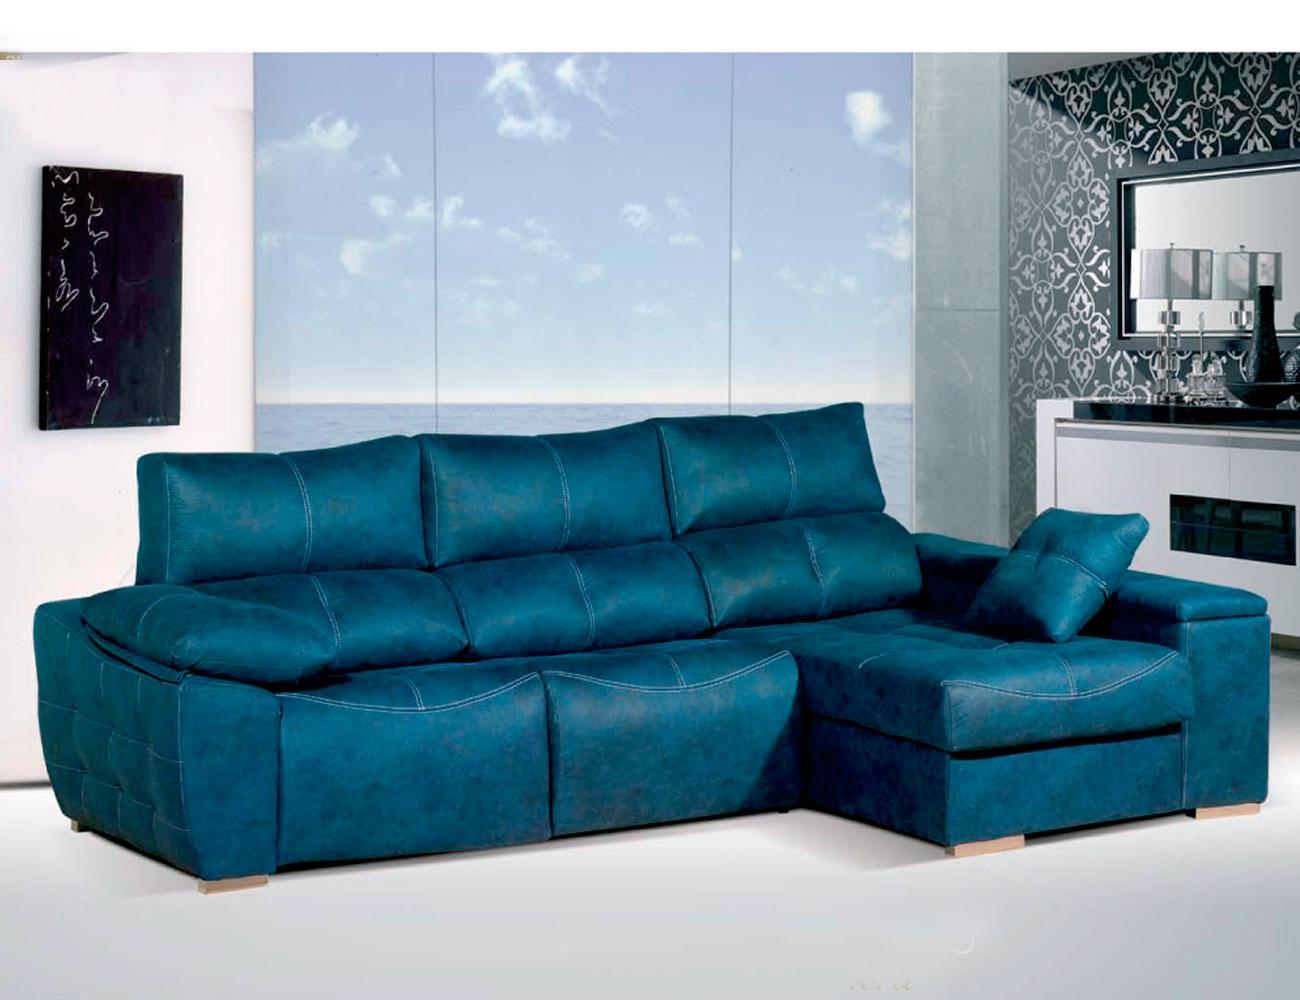 Sofa chaiselongue relax 2 motores anti manchas turquesa36